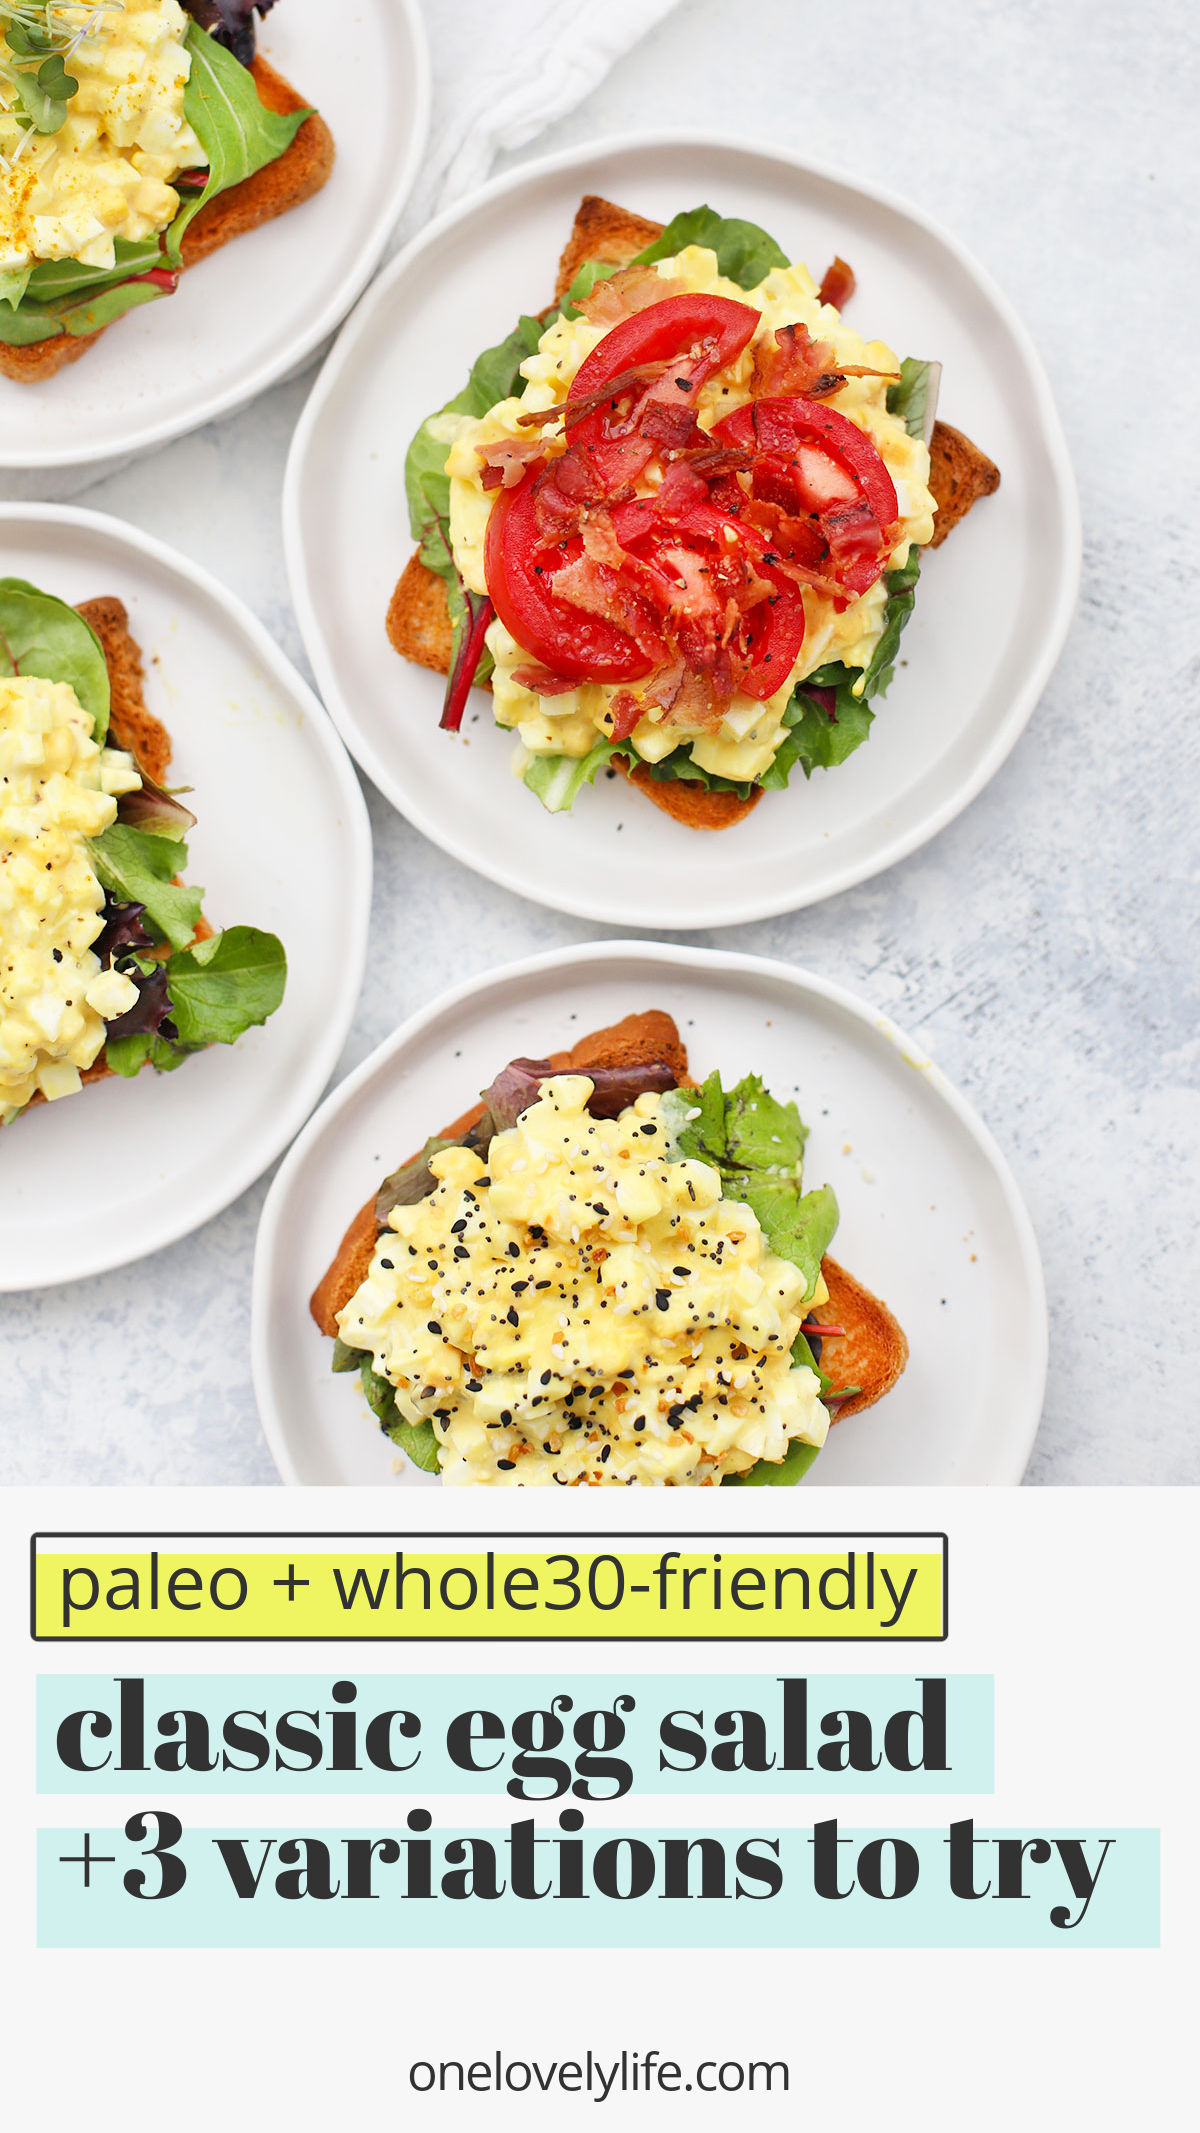 Classic Egg Salad + 3 Yummy Variations to Try - Simple and classic, this egg salad is such a yummy lunch! Don't miss 3 of my favorite delicious variations below! (Gluten free, paleo) // BLT Egg Salad Recipe // Everything Bagel Seasoning Egg Salad // Egg Salad on Toast // Curry Egg Salad // Paleo Egg Salad // Gluten Free Egg Salad #eggsalad #paleo #glutenfree #dairyfree #hardboiledeggs